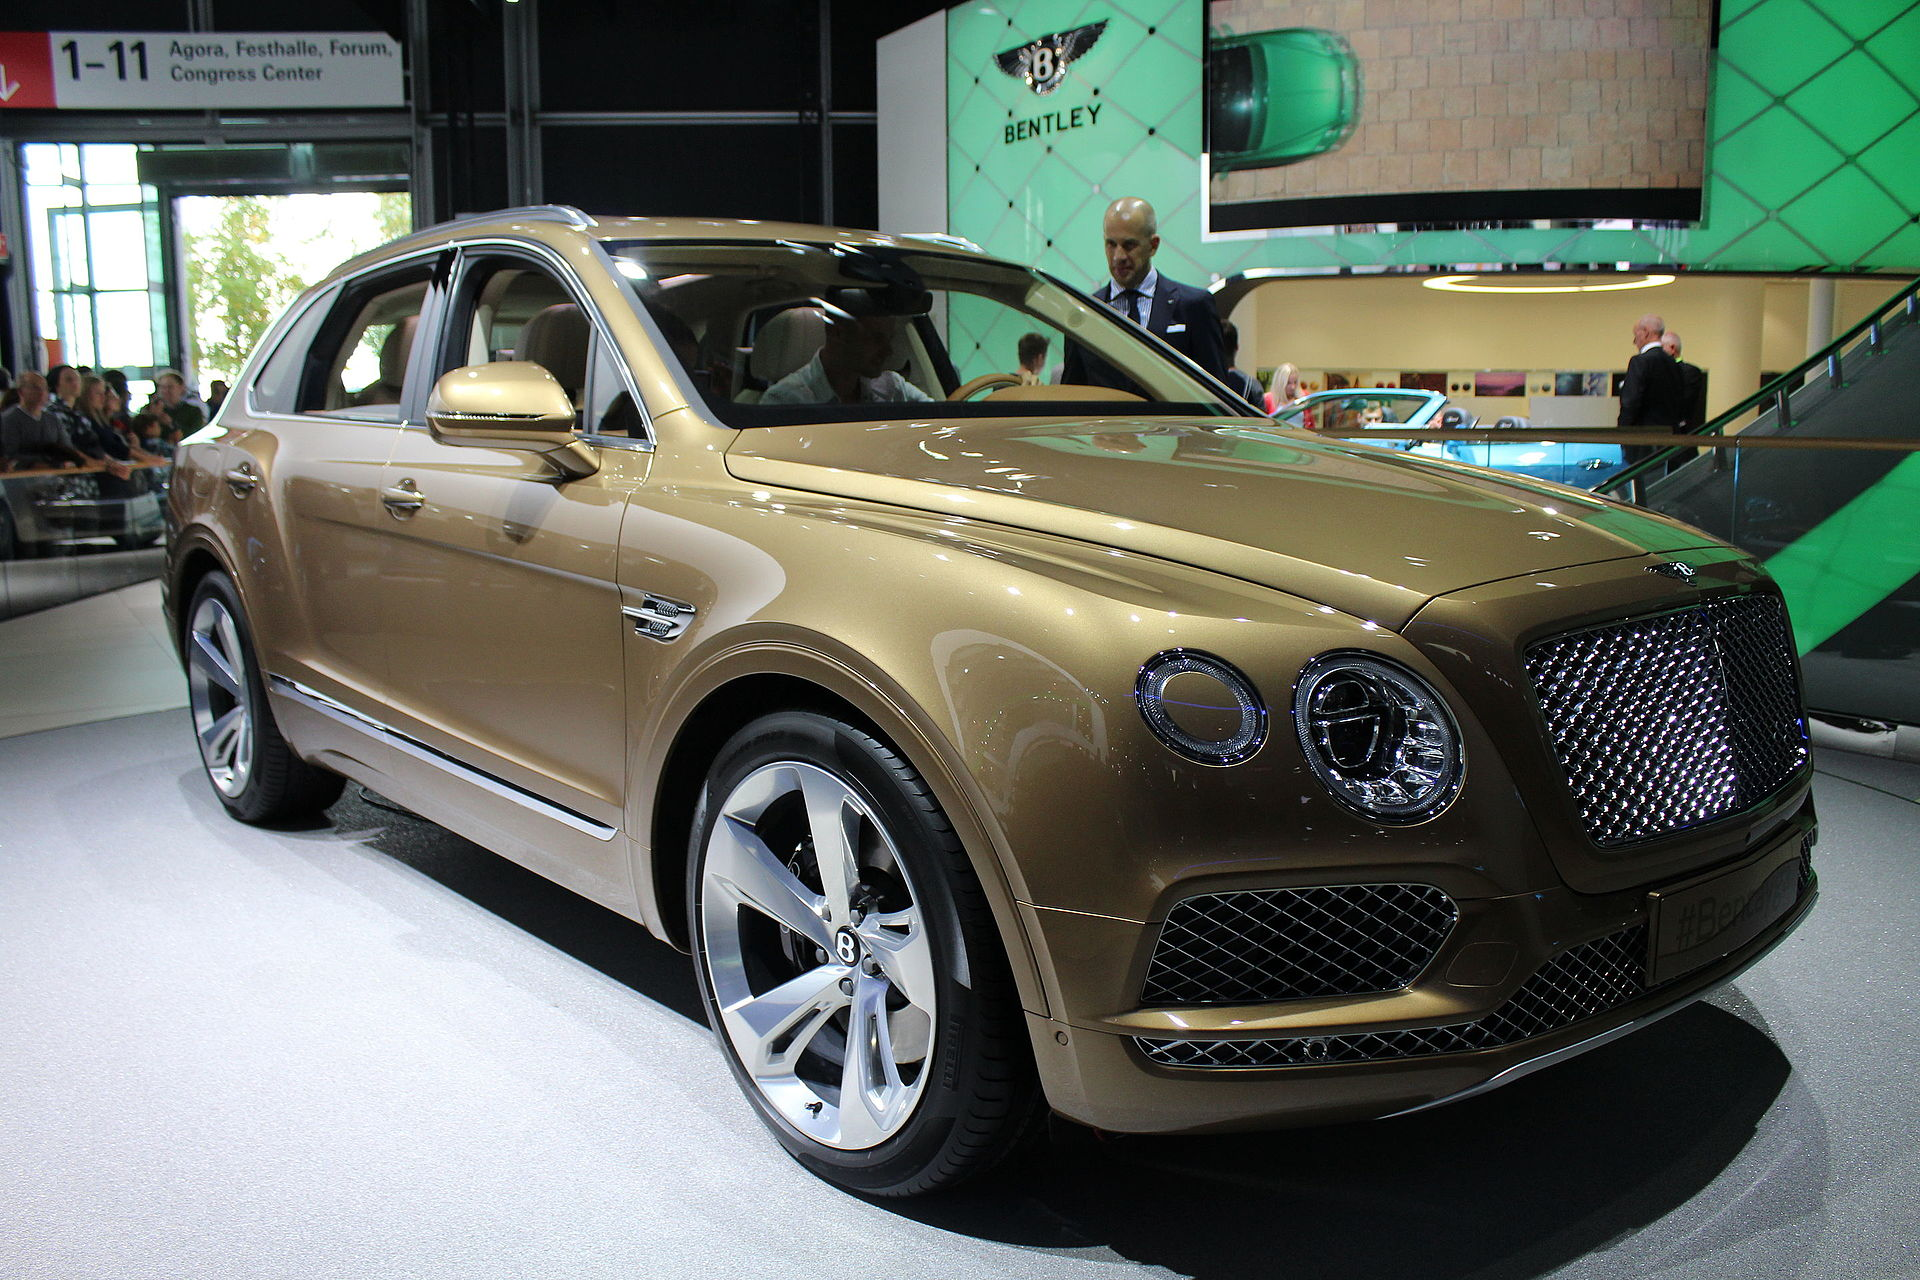 Range Rover Suv >> Bentley Bentayga - Wikipedia